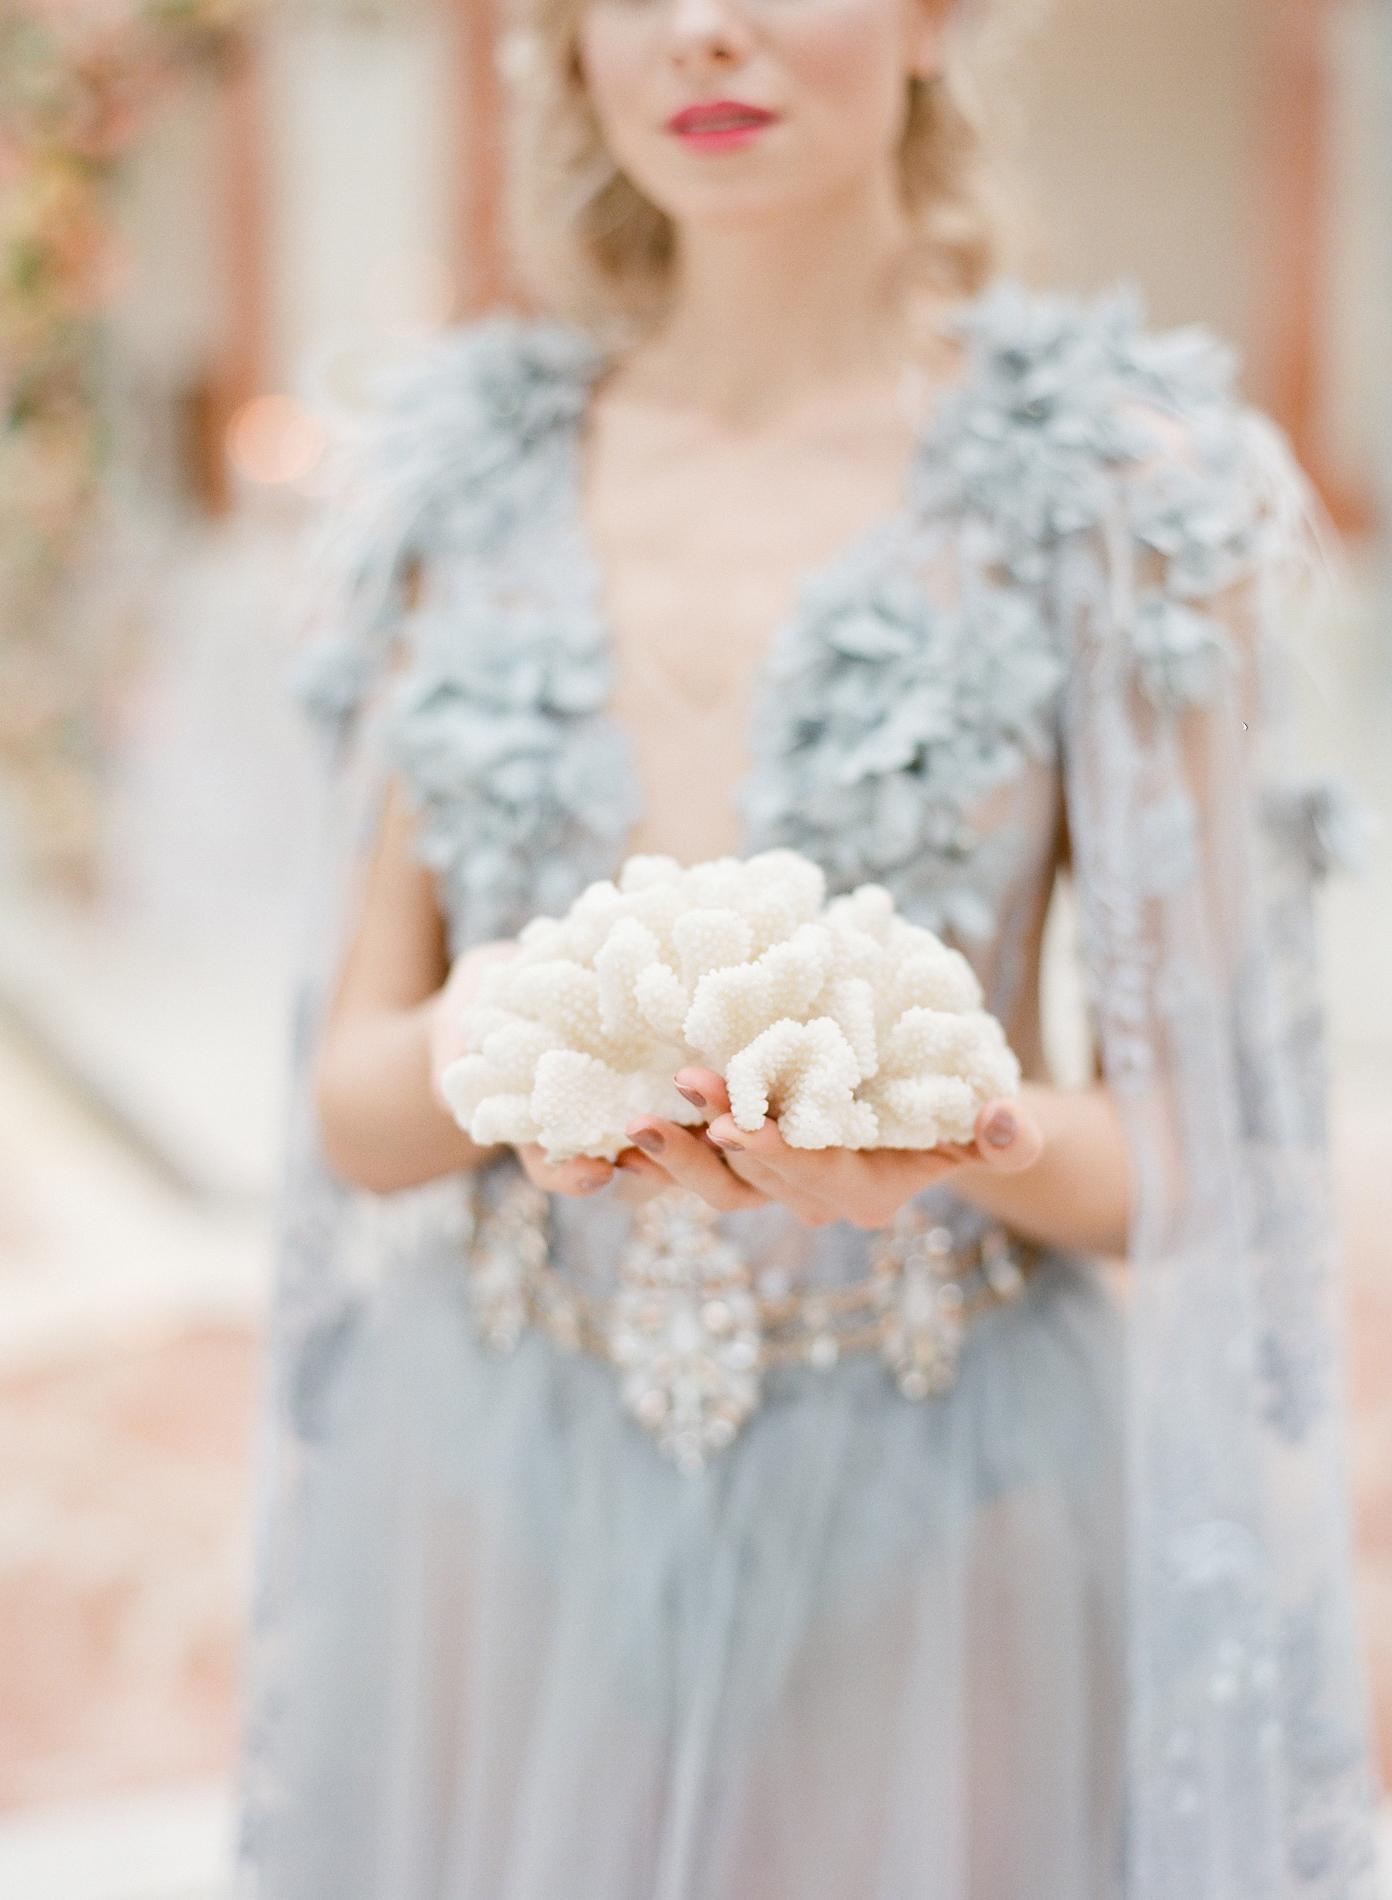 galicia_nueva_wedding_photographer_nikol_bodnarova_italy_wedding_photographer_91.JPG